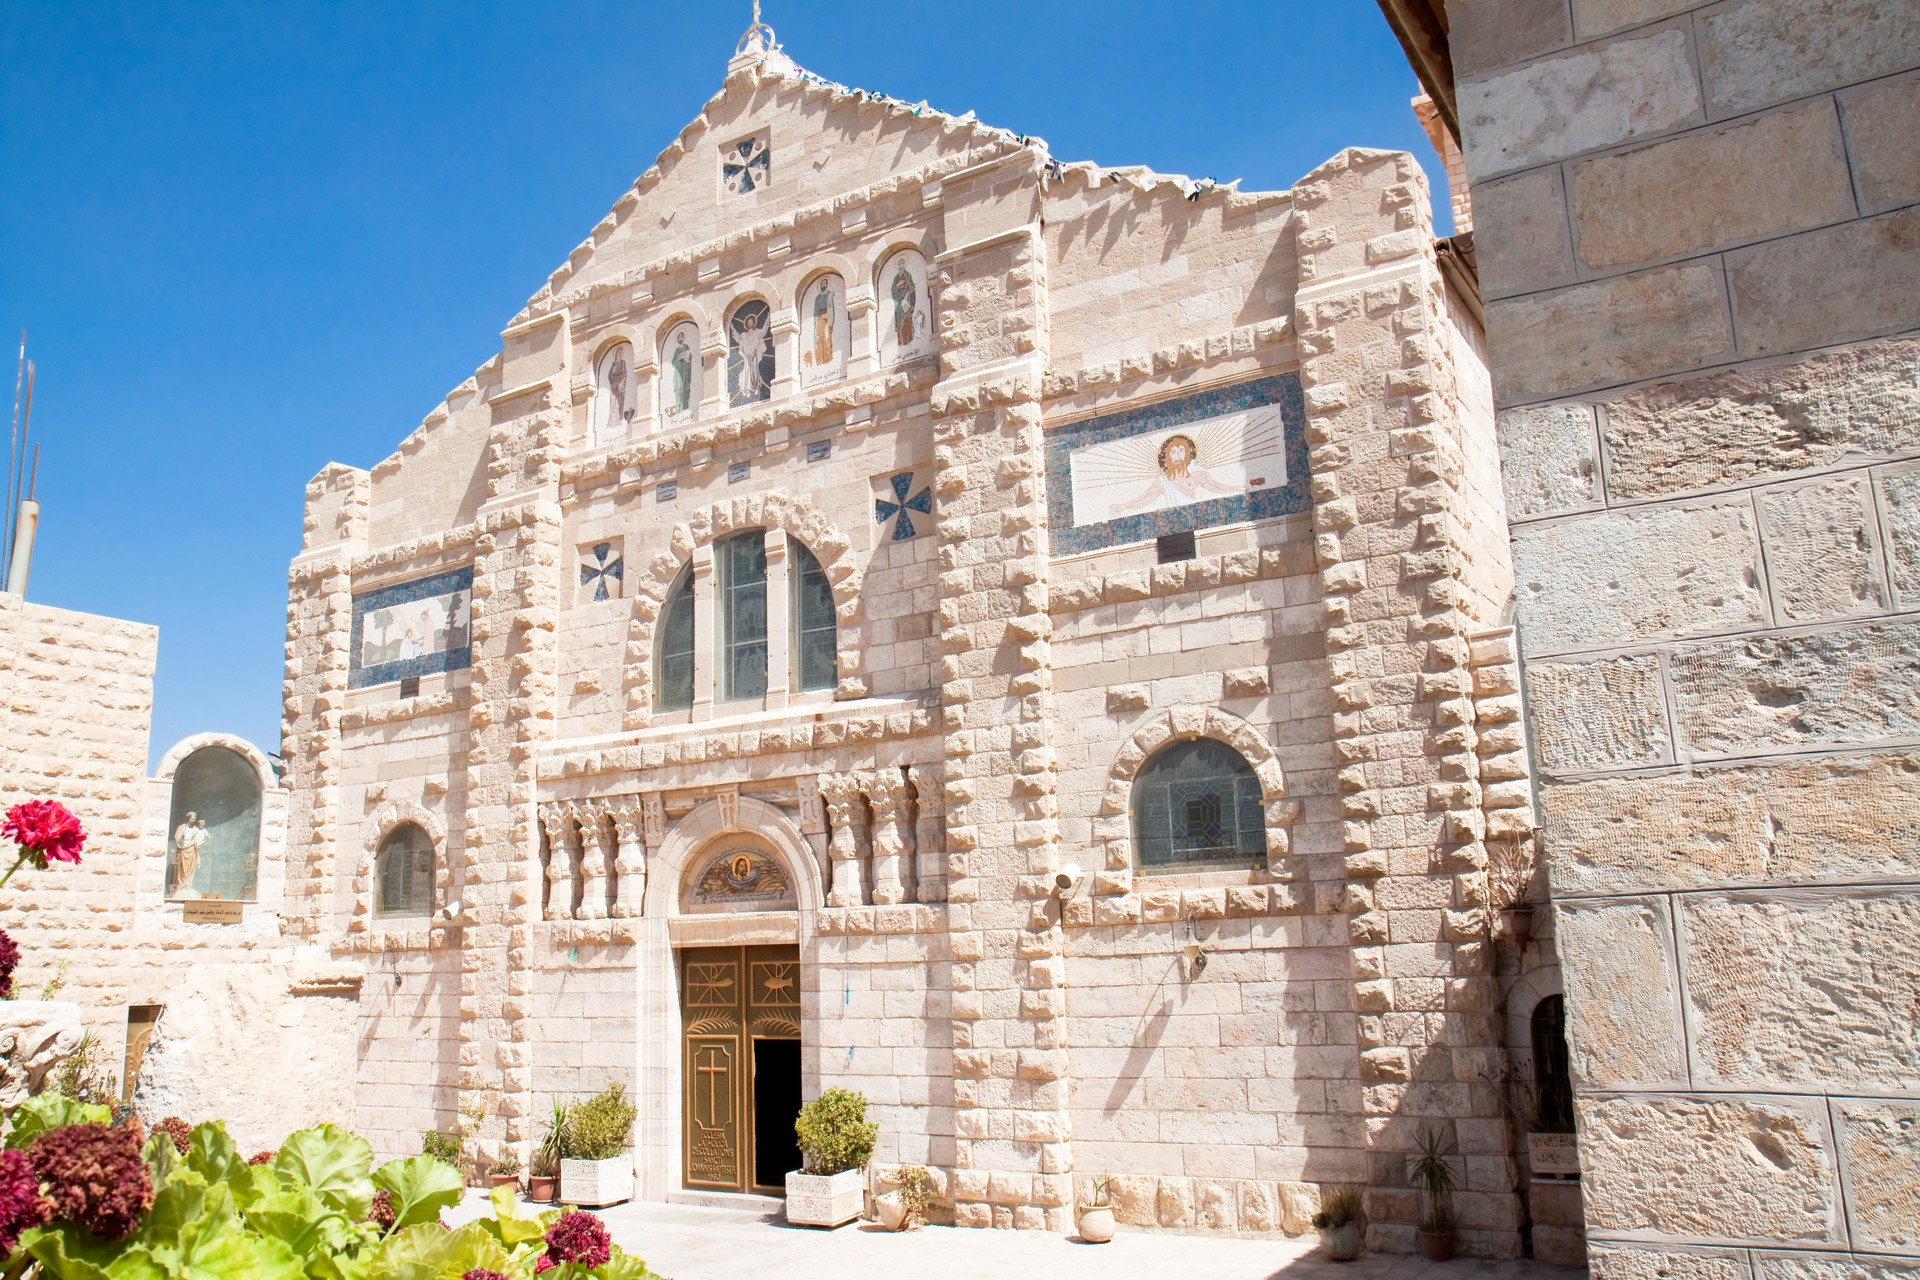 Catholic Church Of St.John the Baptist in Madaba, Jordan